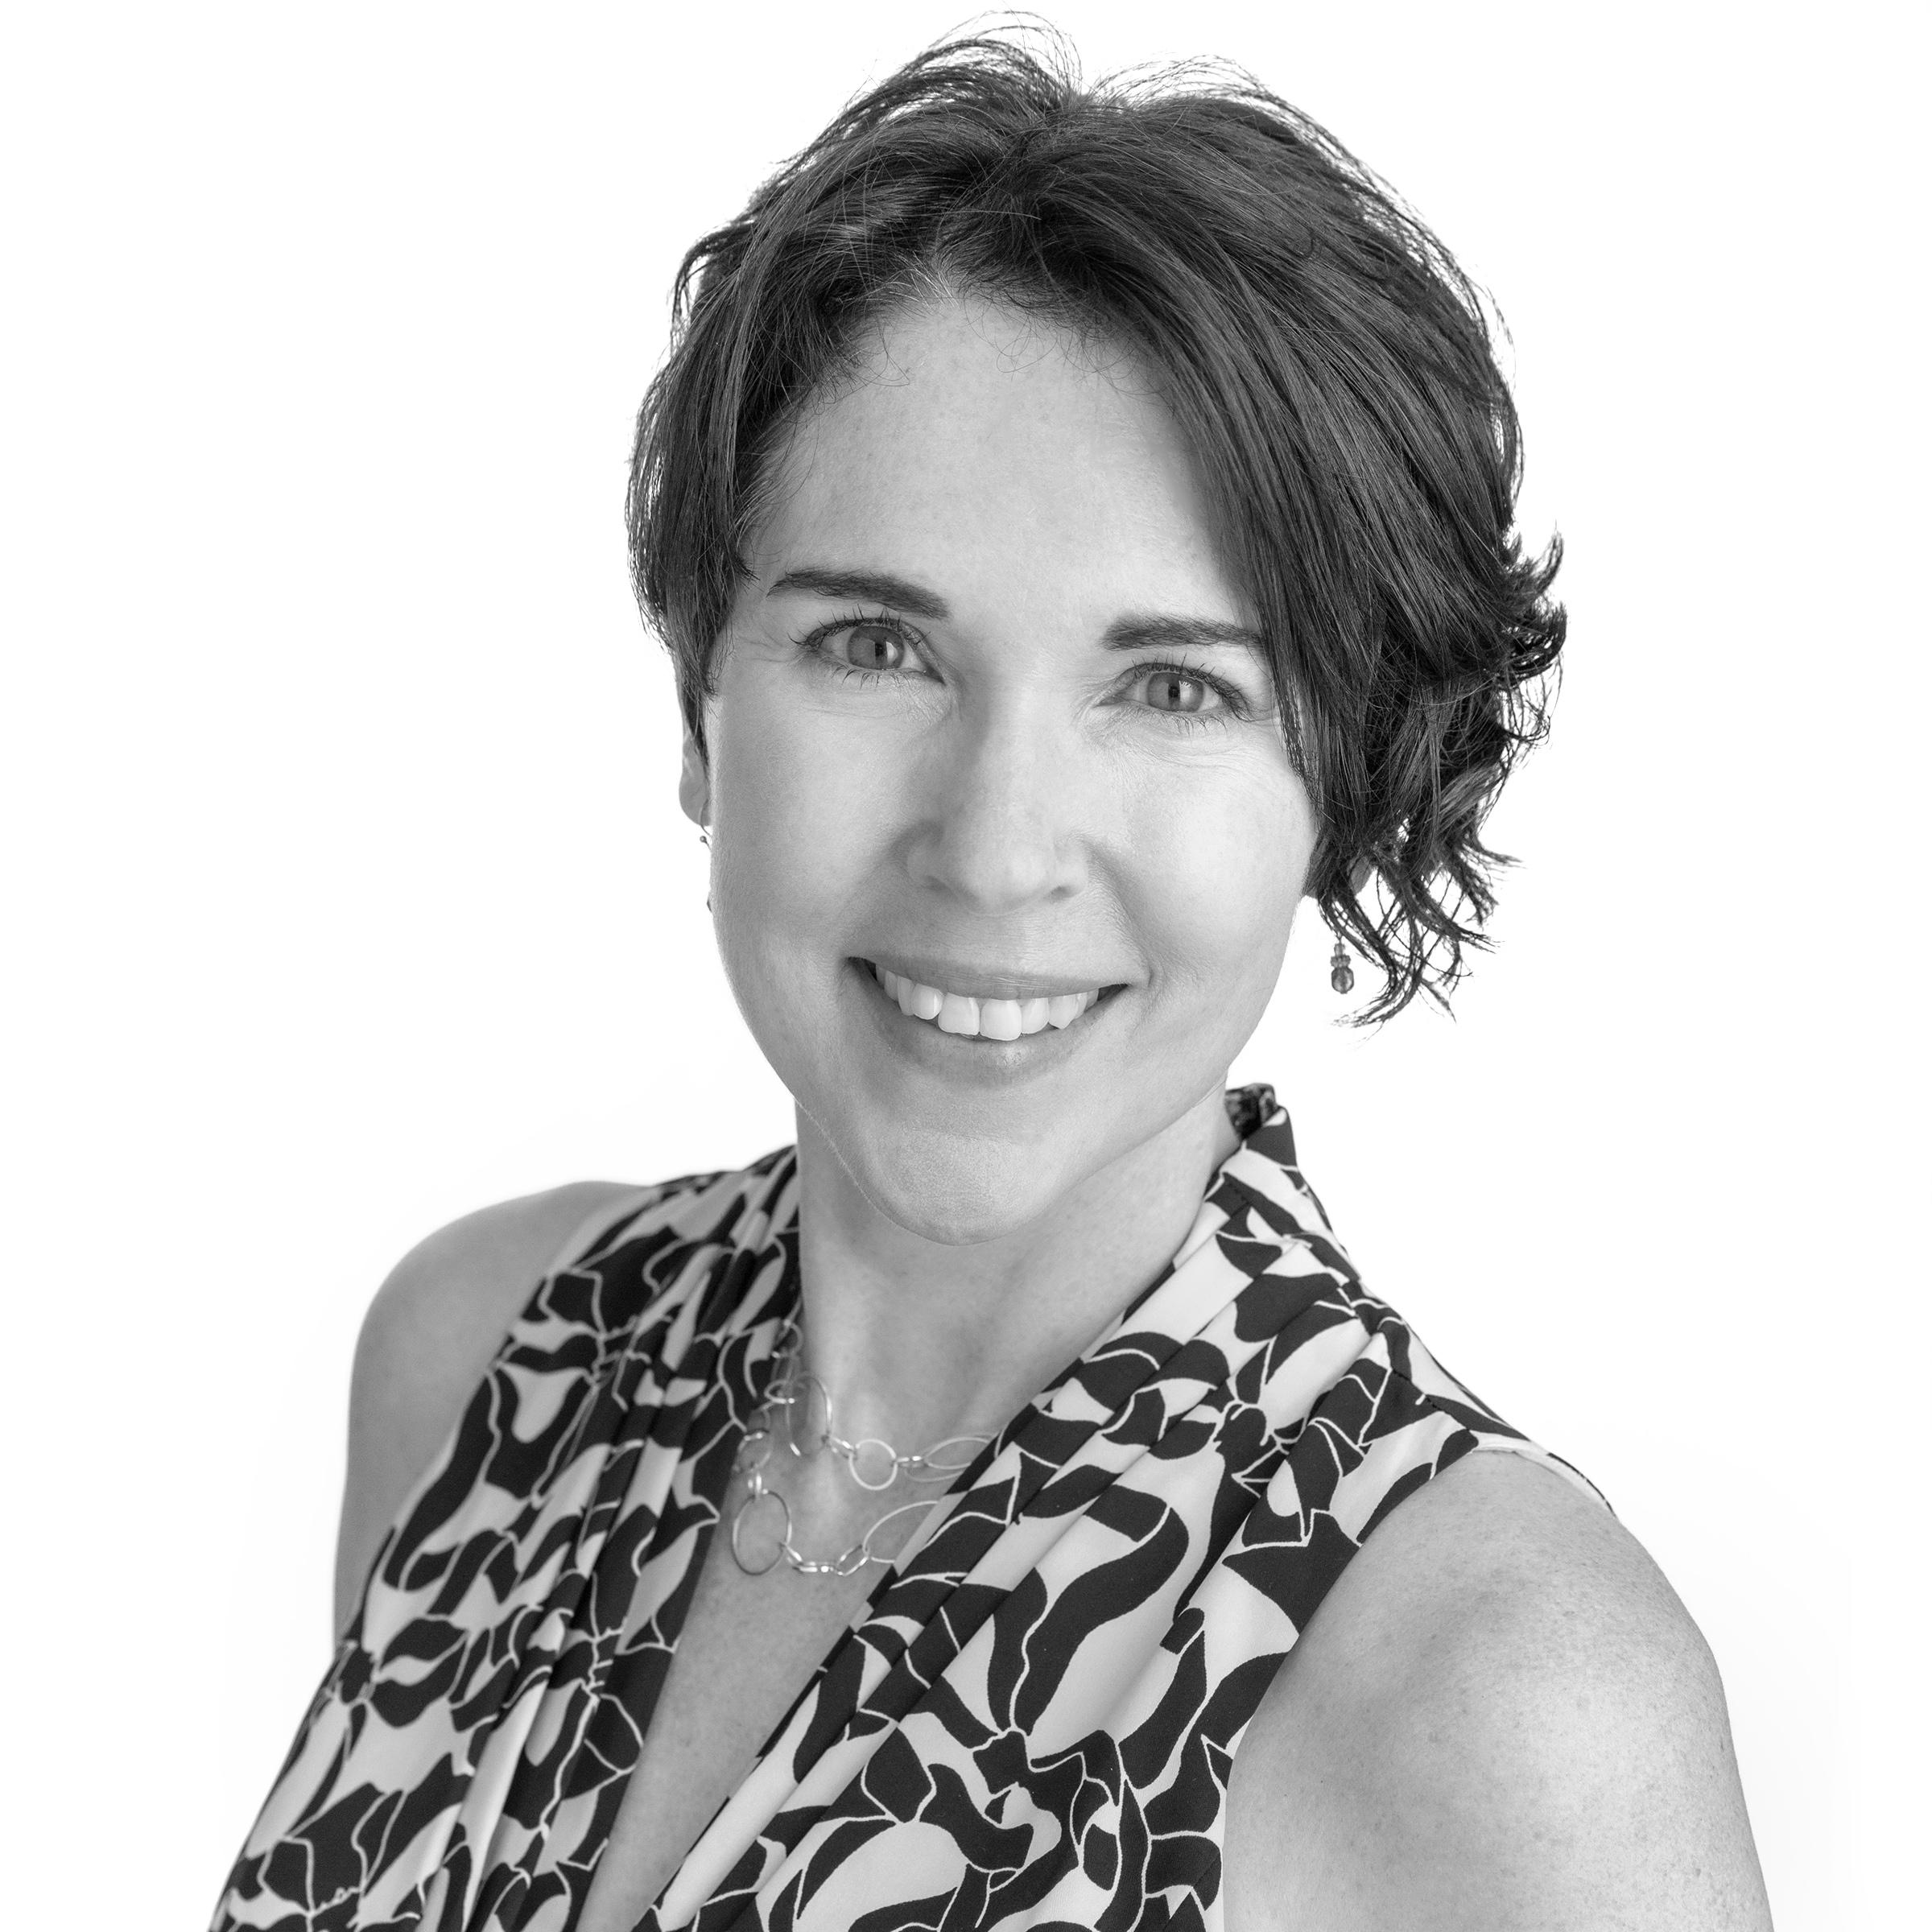 Tracy Teuscher, The Buzz Maker, Public Relations, PR, President, Accredited, APR, Queen Bee.